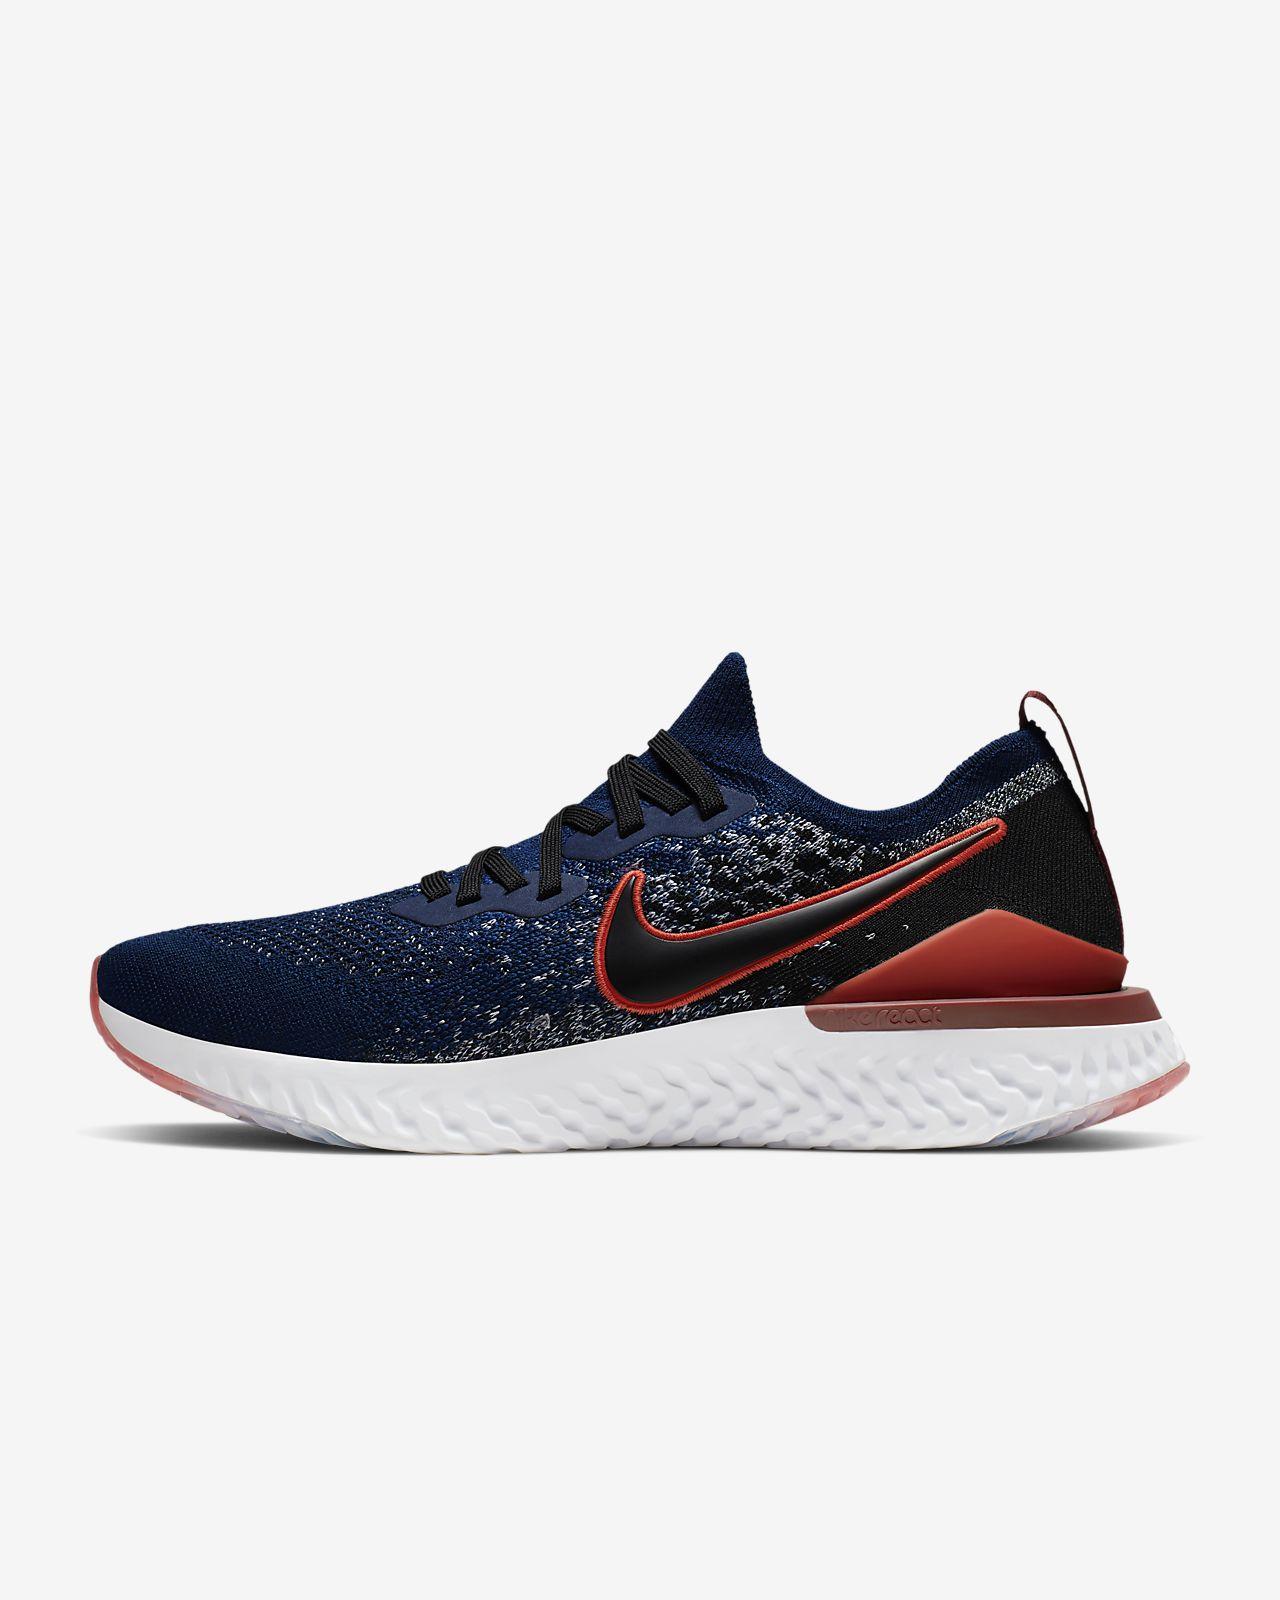 Nike Free 5.0 Men's Running Shoe Color:BlackDark Grey